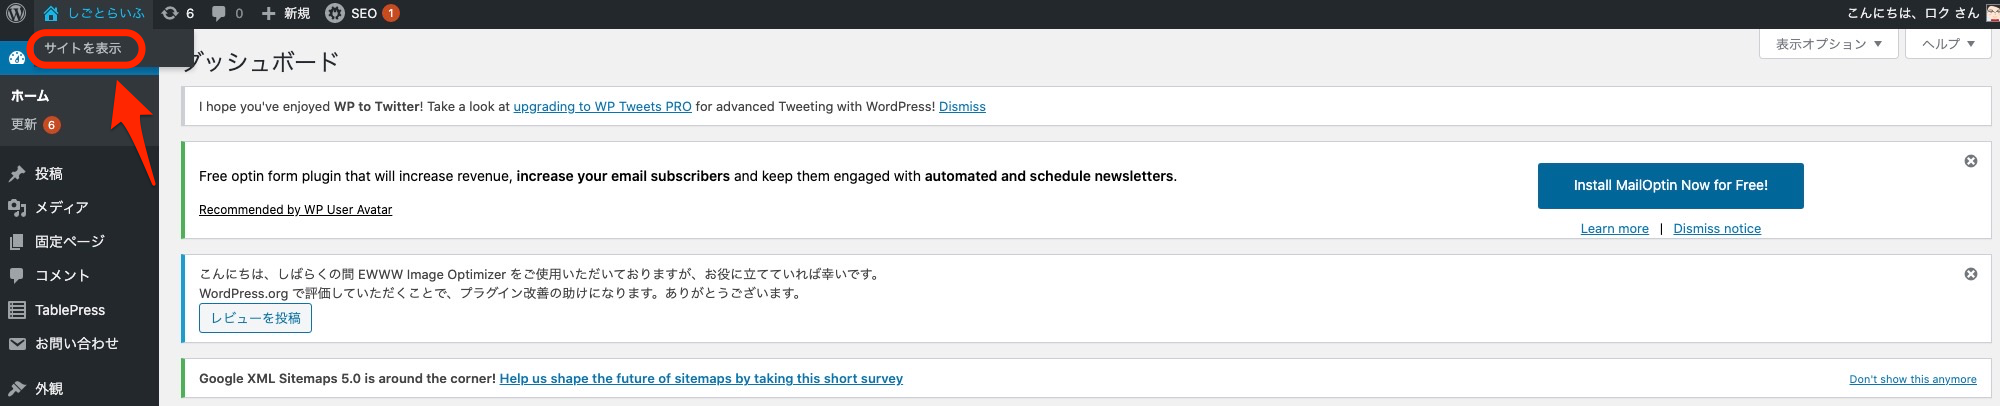 WordPress サイト 表示